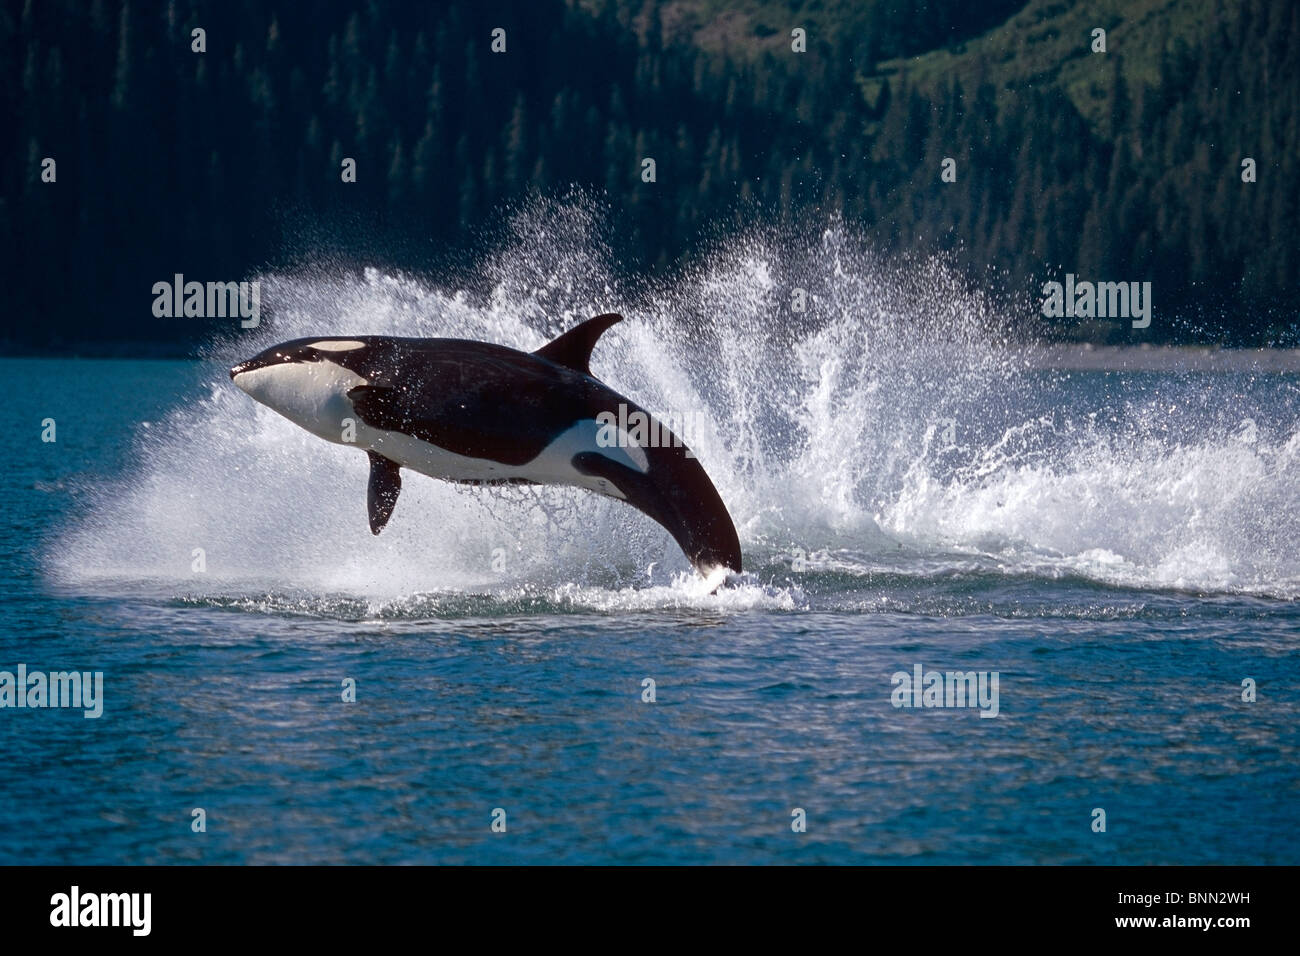 Double Breaching Orcas Bainbridge Passage Prince William Sound Alaska Summer Southcentral - Stock Image